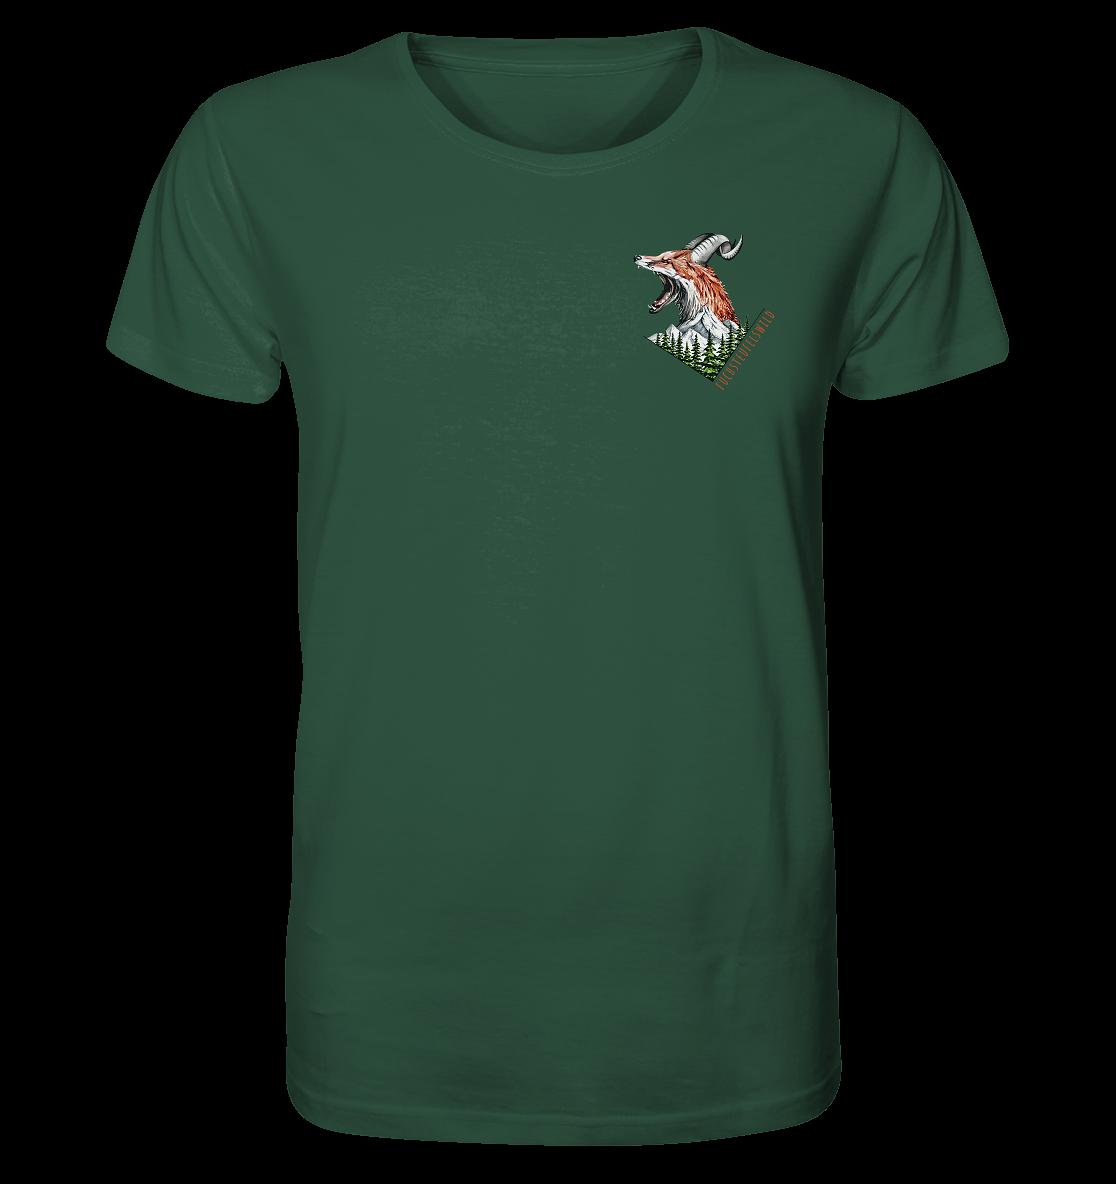 front-organic-shirt-2f5240-1116x-2.png